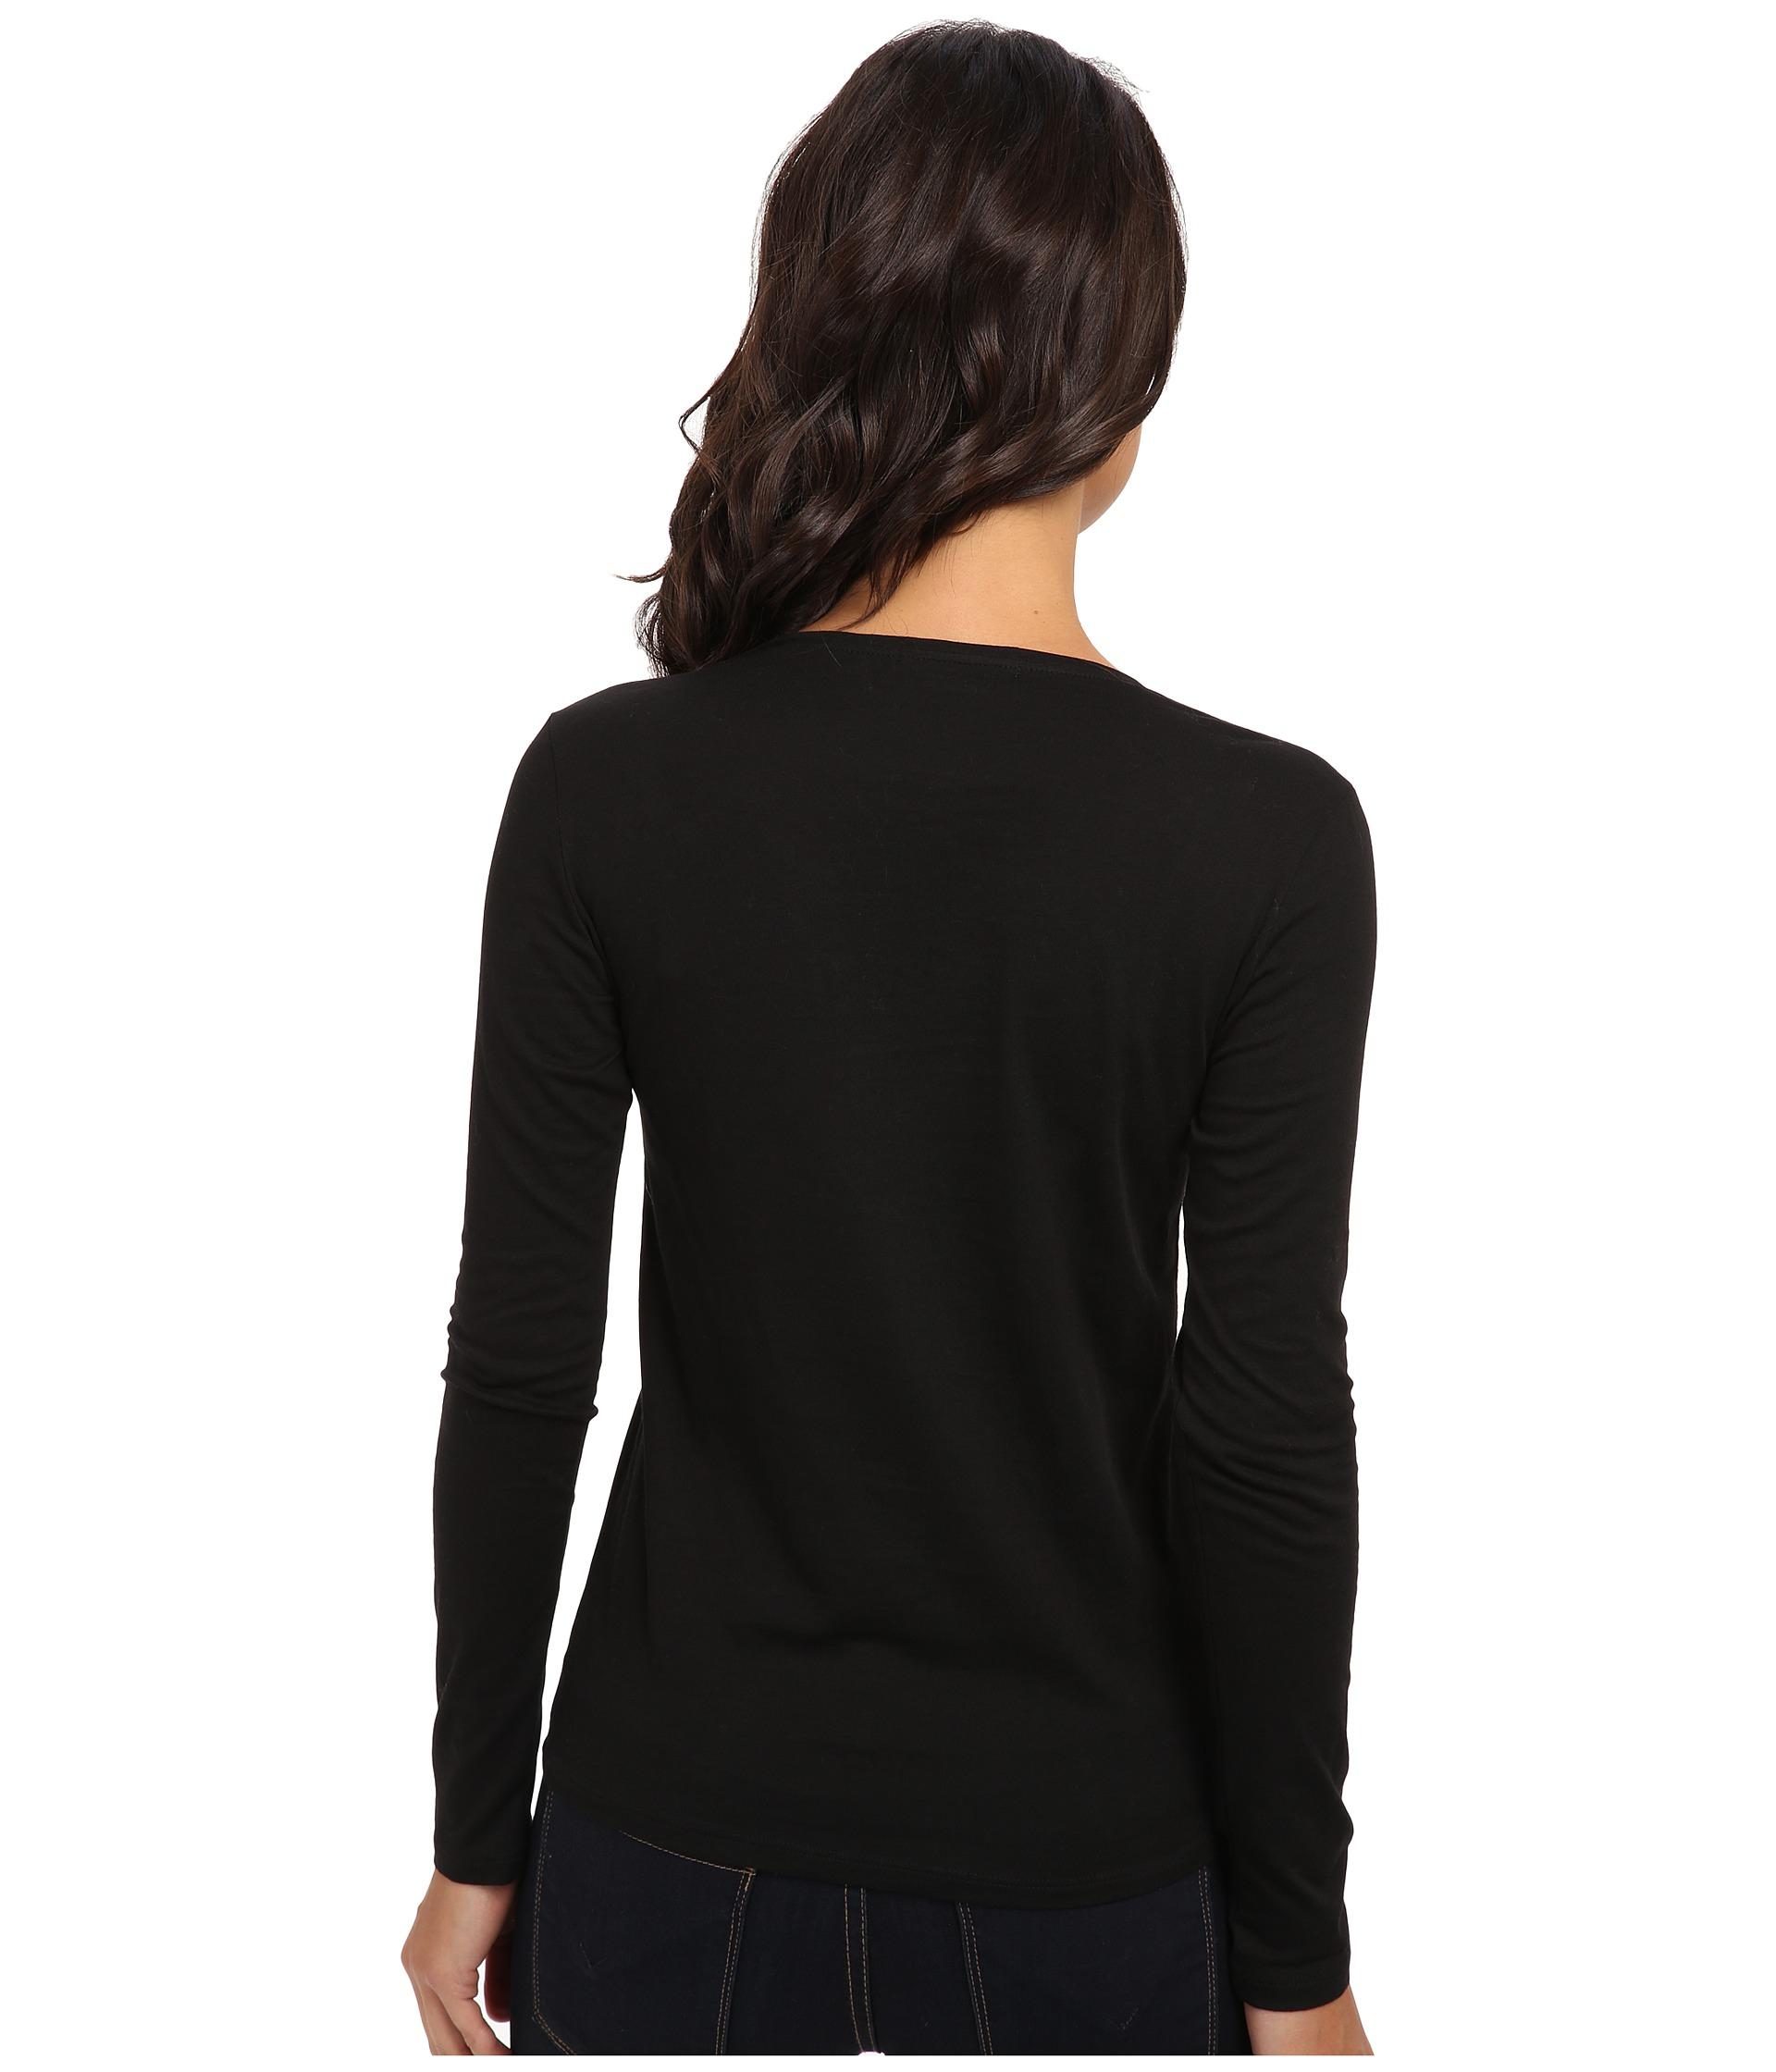 lacoste long sleeve cotton v neck t shirt in black lyst. Black Bedroom Furniture Sets. Home Design Ideas